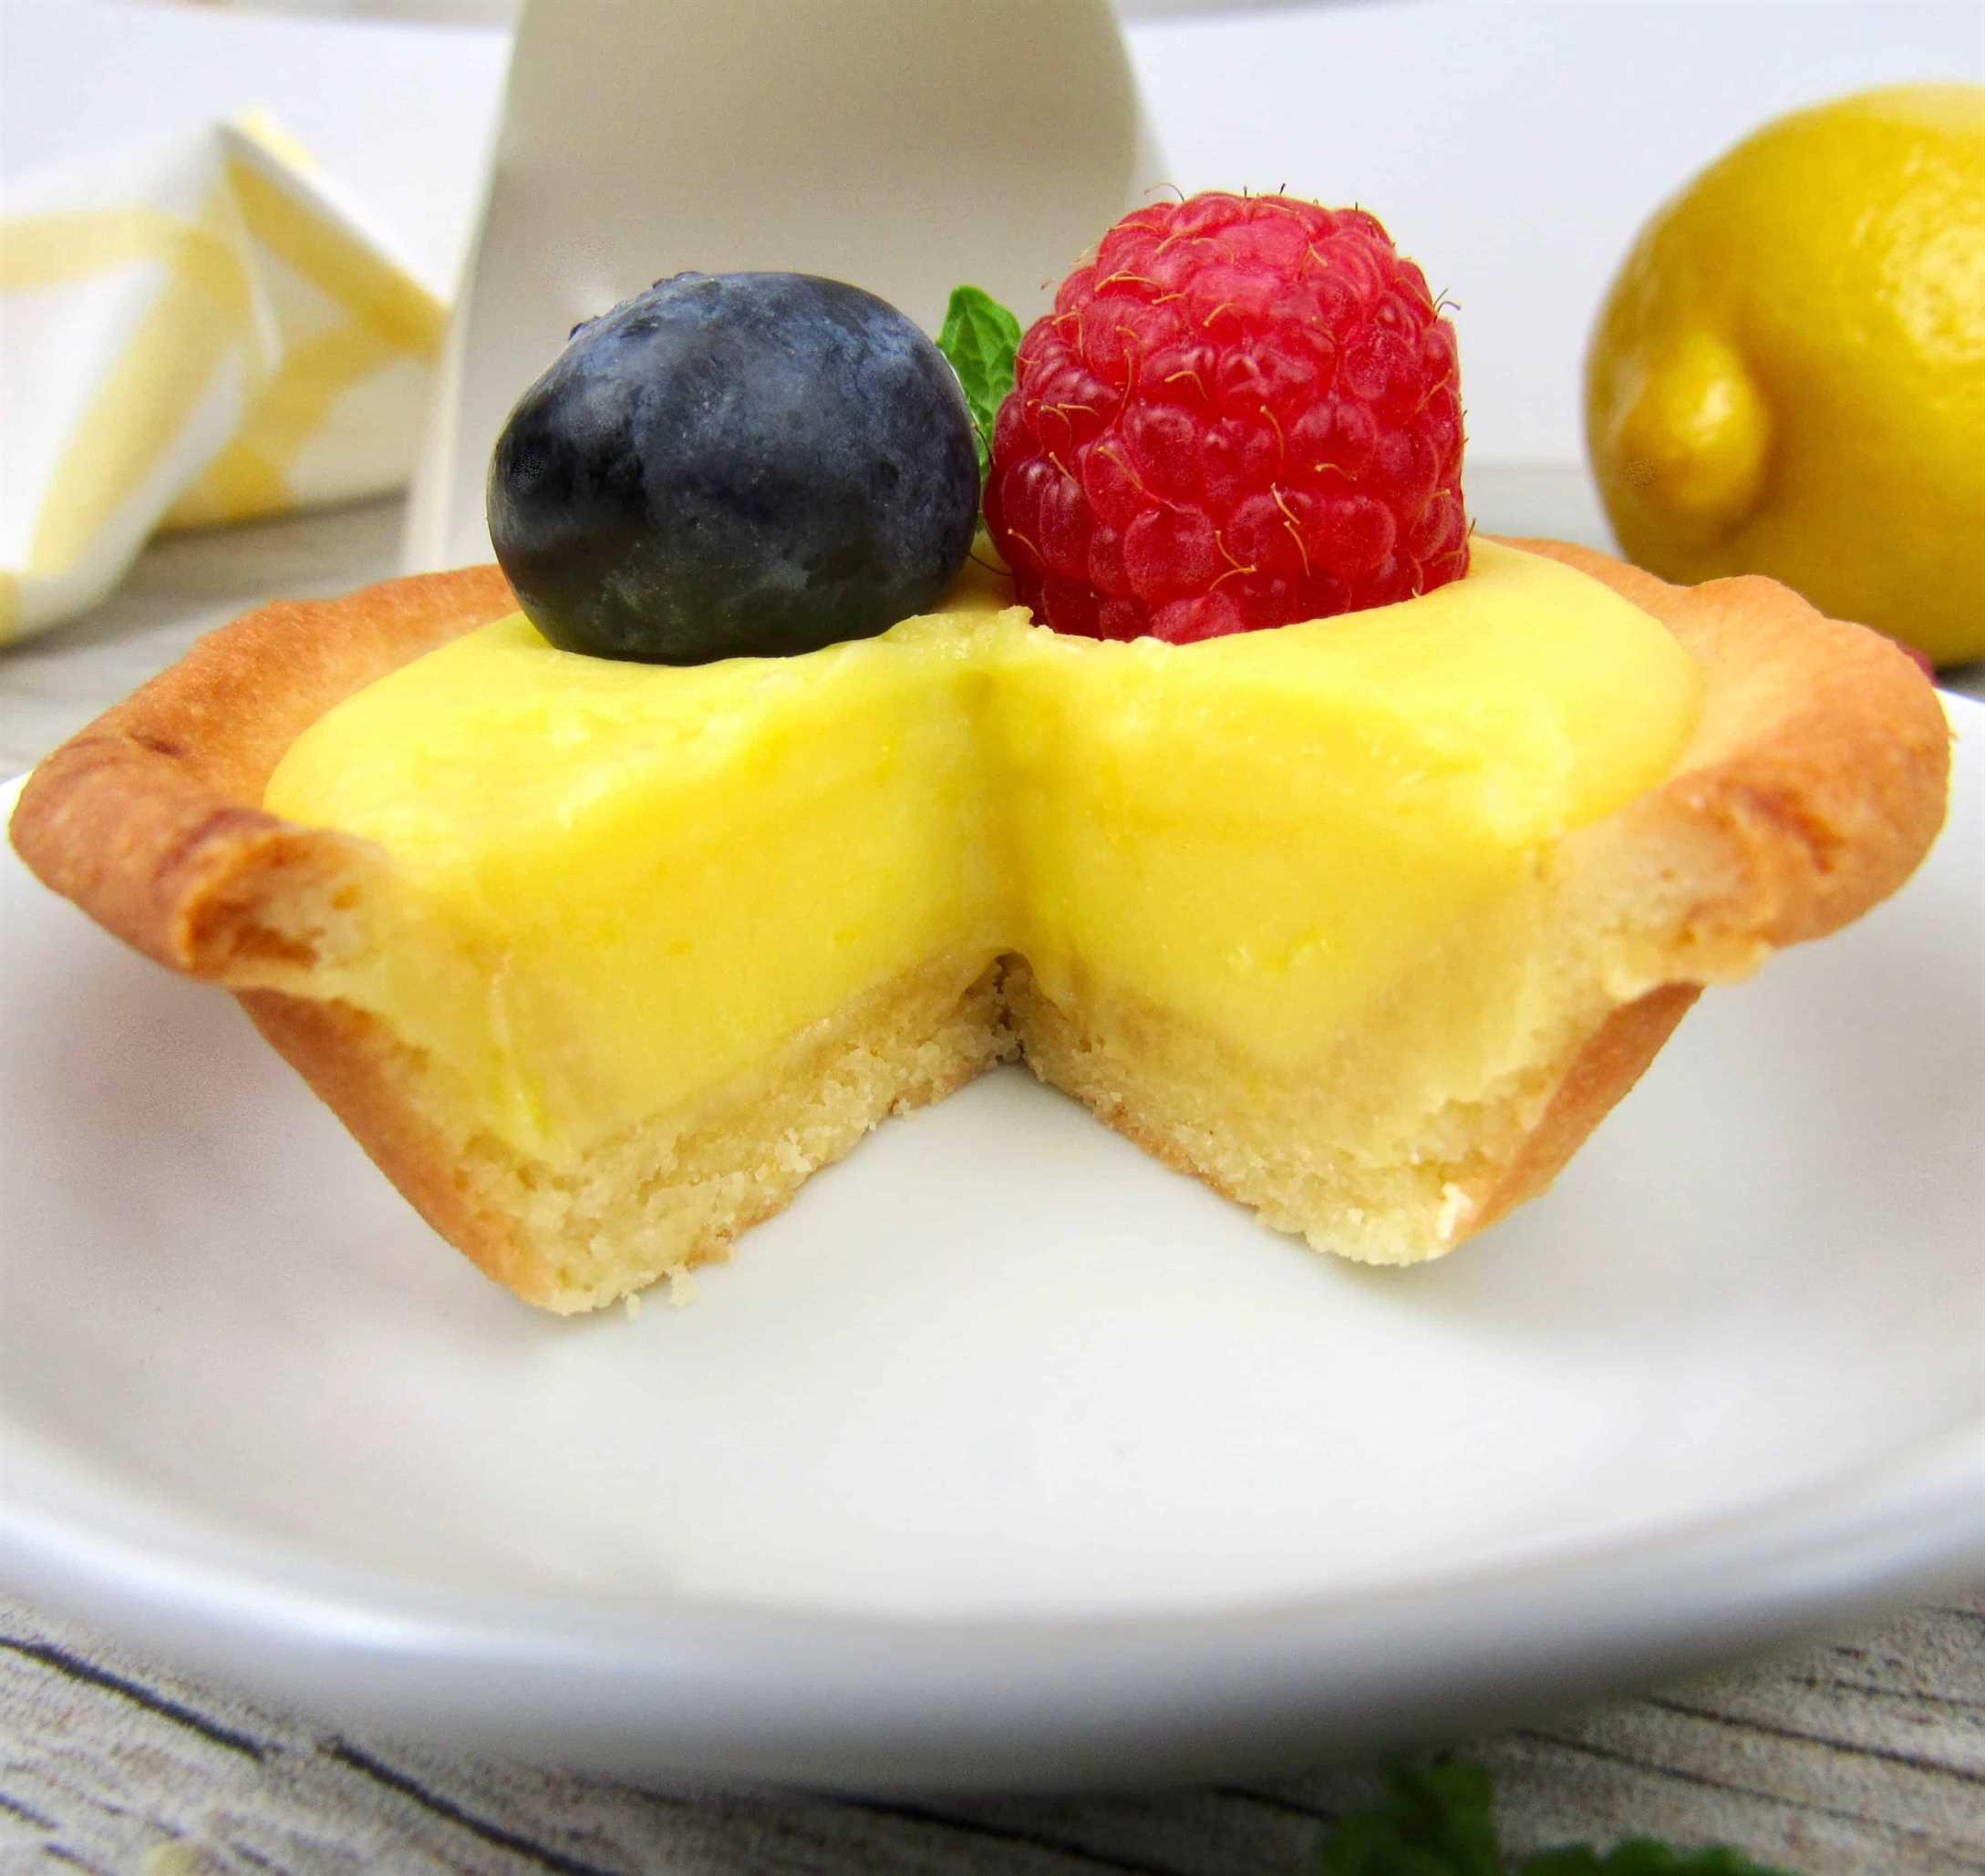 Primer plano de mini tarta de cuajada de limón con rodaja sacar